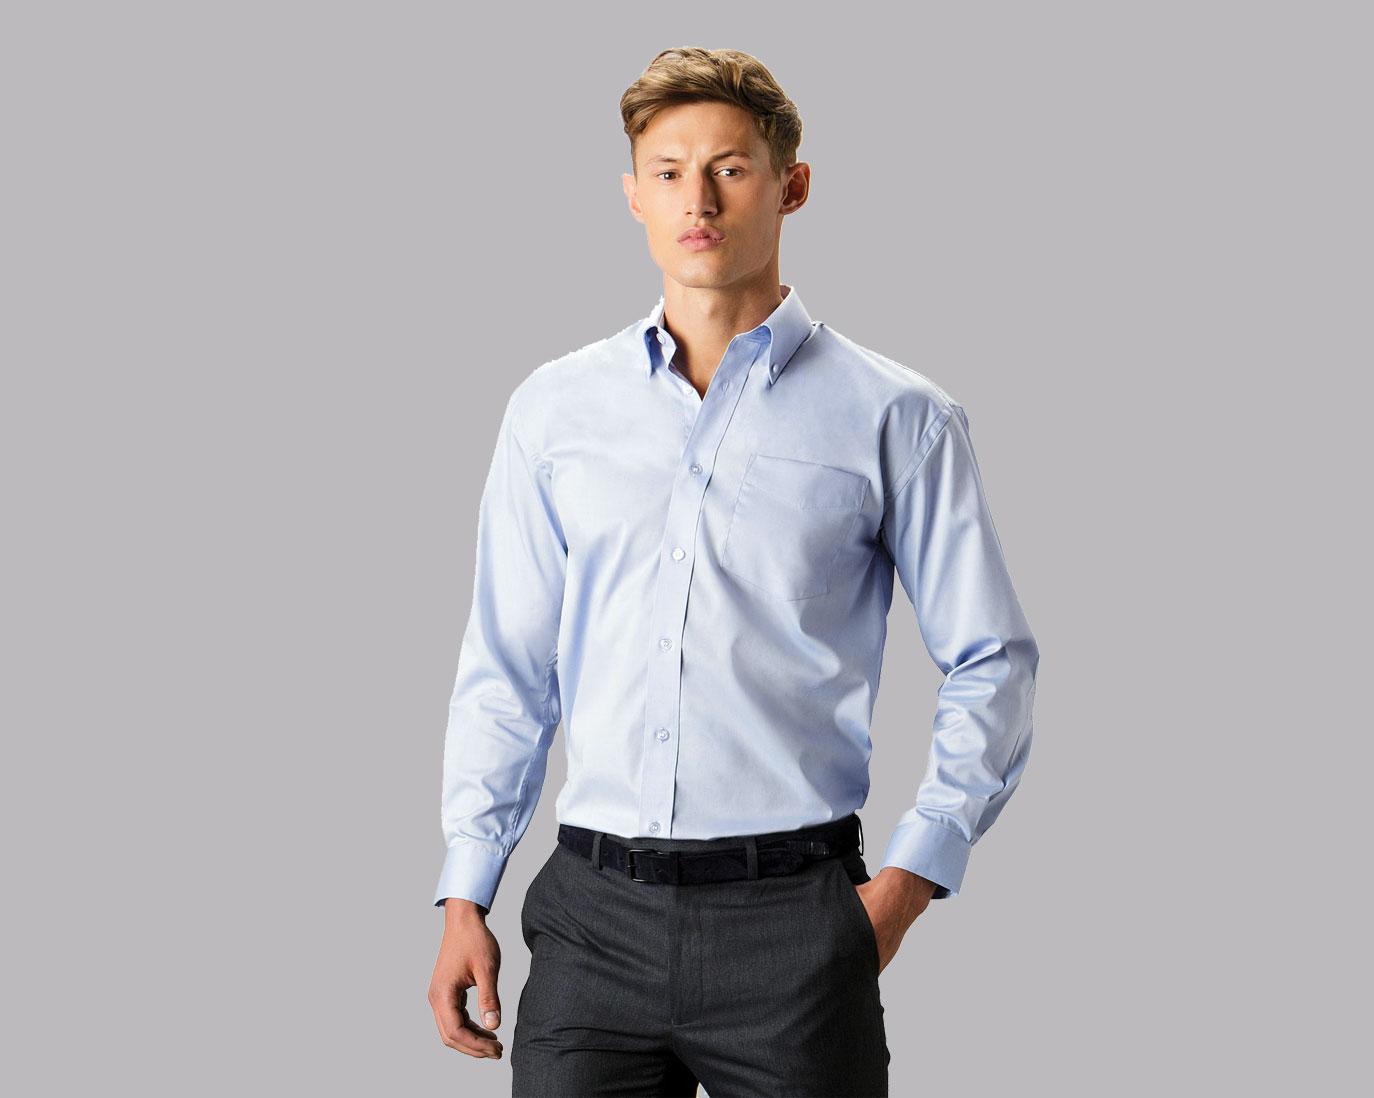 Men's Office Clothing